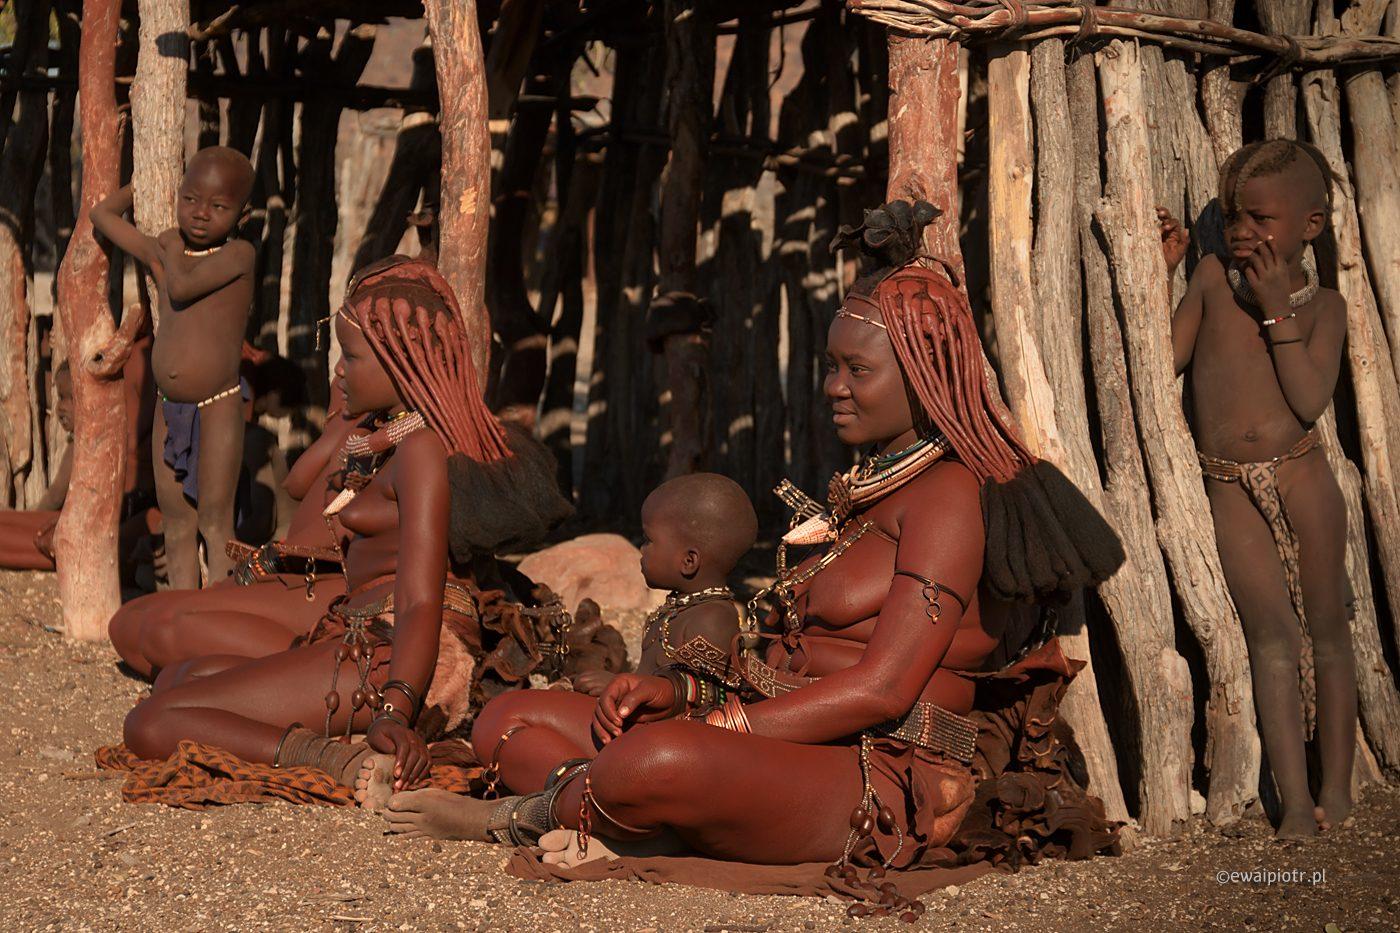 Kobiety z plemienia Himba, Namibia